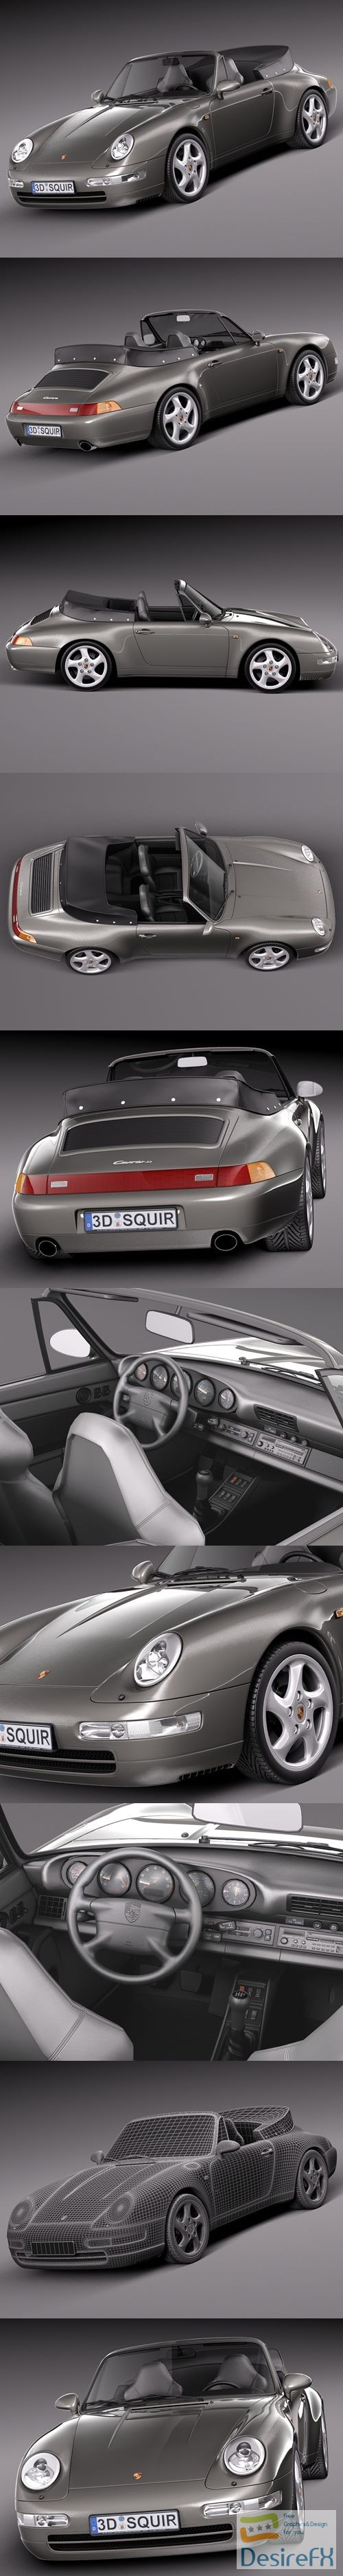 Porsche 911 993 Carrera Cabrio 1994-1997 3D Model